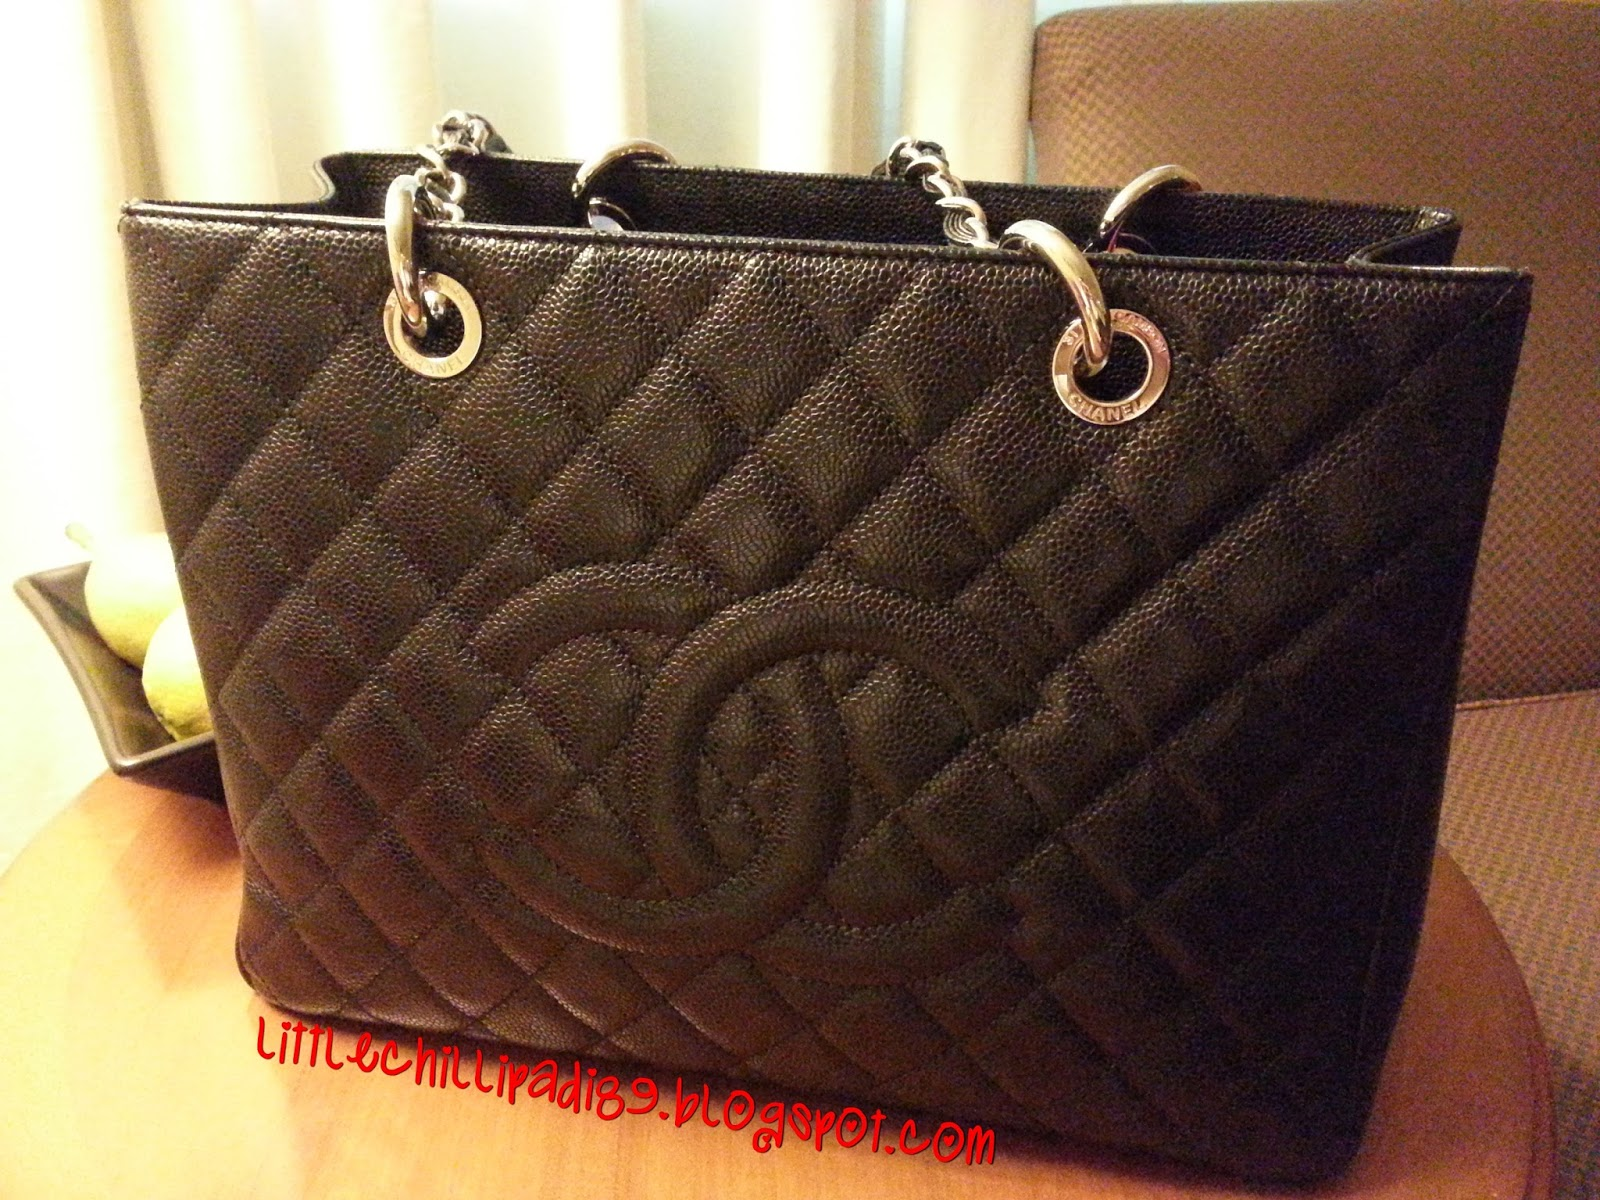 b51fbbe46c4c littlechillipadi  Review of Chanel GST(Grand Shopping Tote)